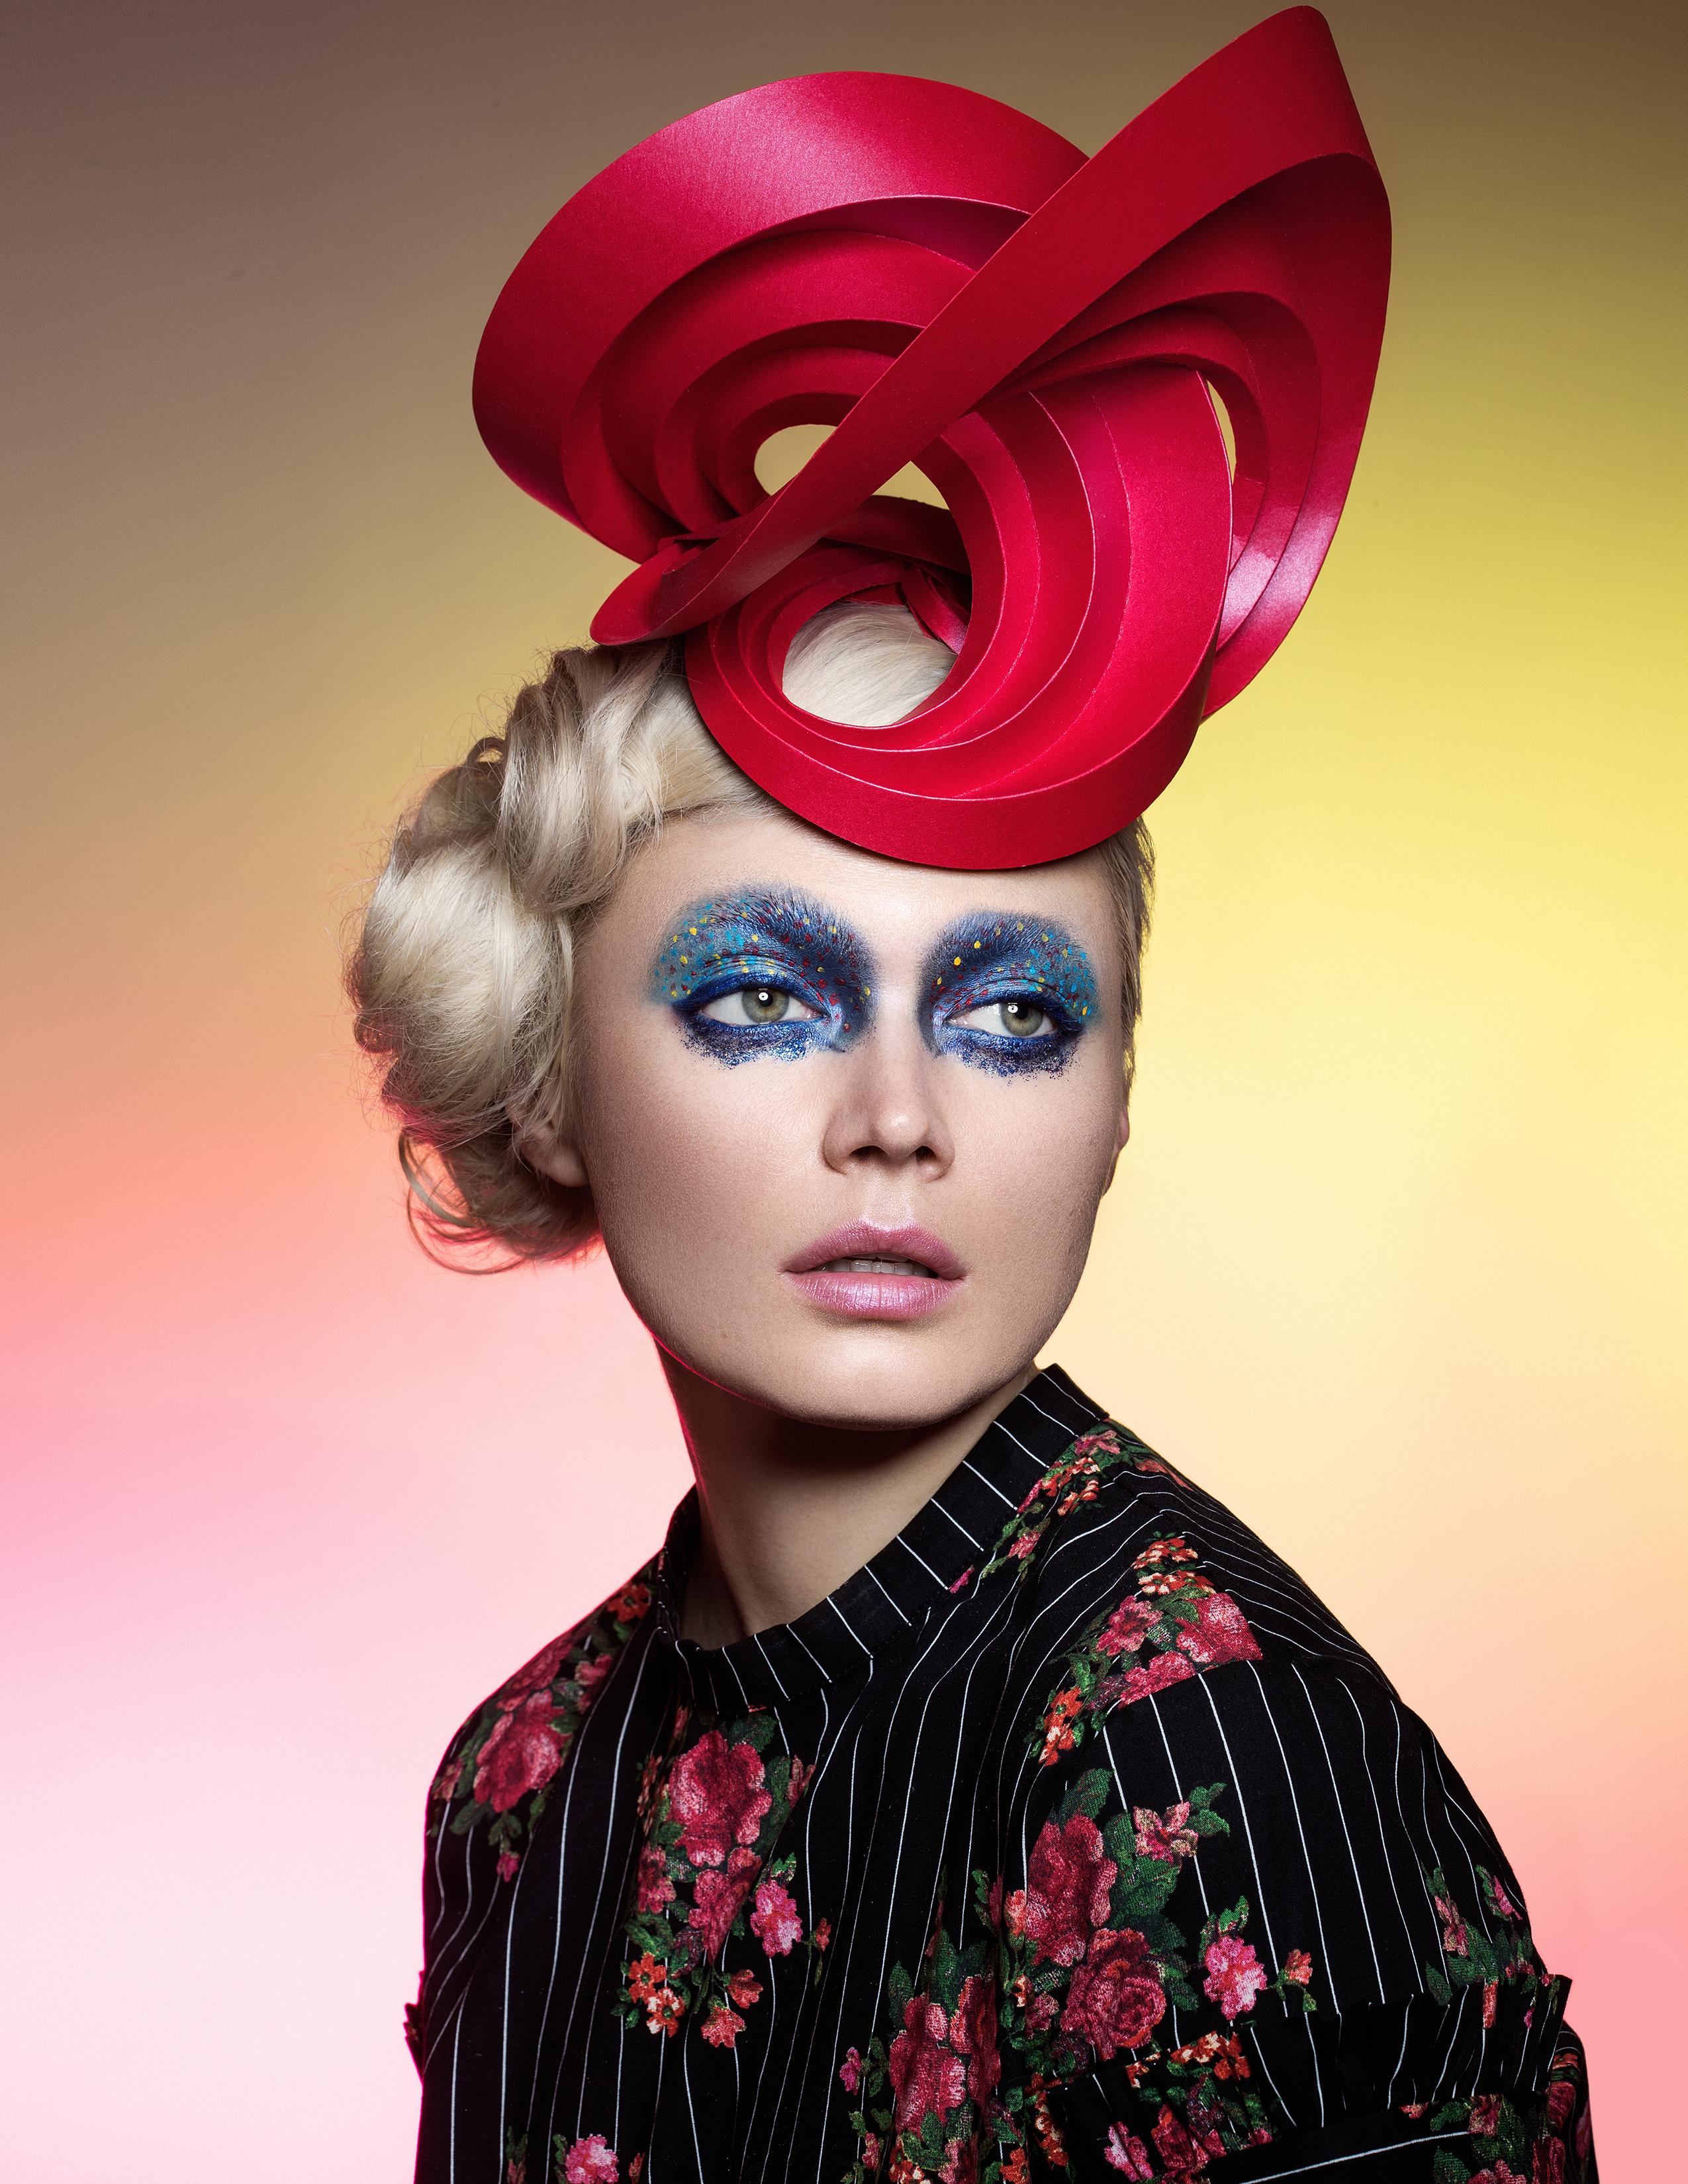 hotographer Ylva Erevall Model Khrystane paperheadpiece chuchuny Hair Koji Ichlkawa Makeup deeptisadhwani